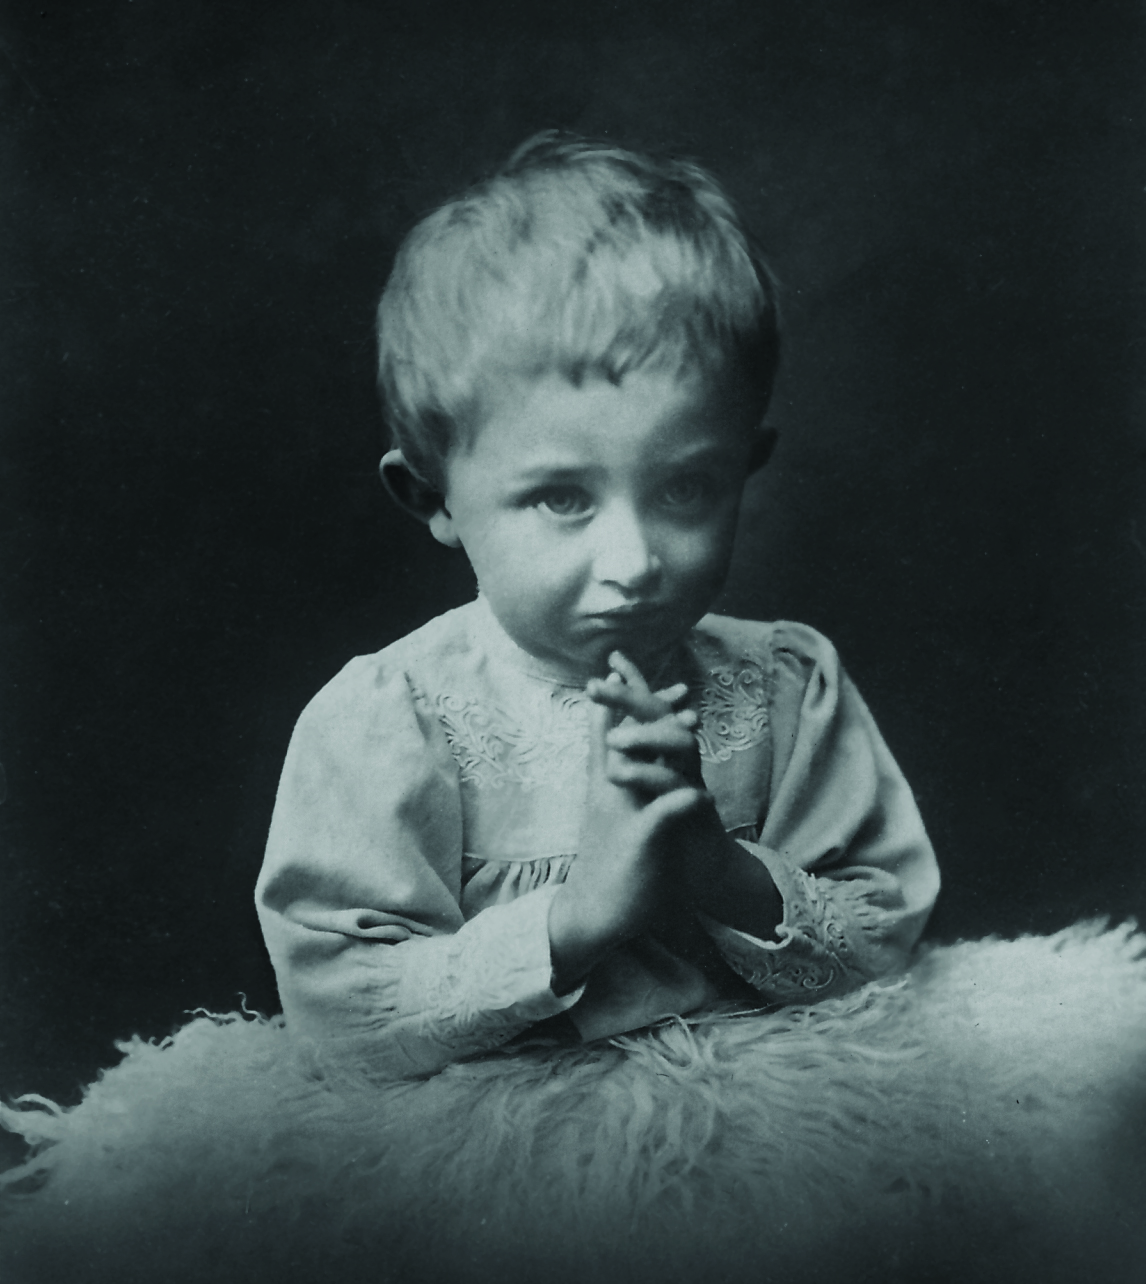 Childhood7_BW.jpg